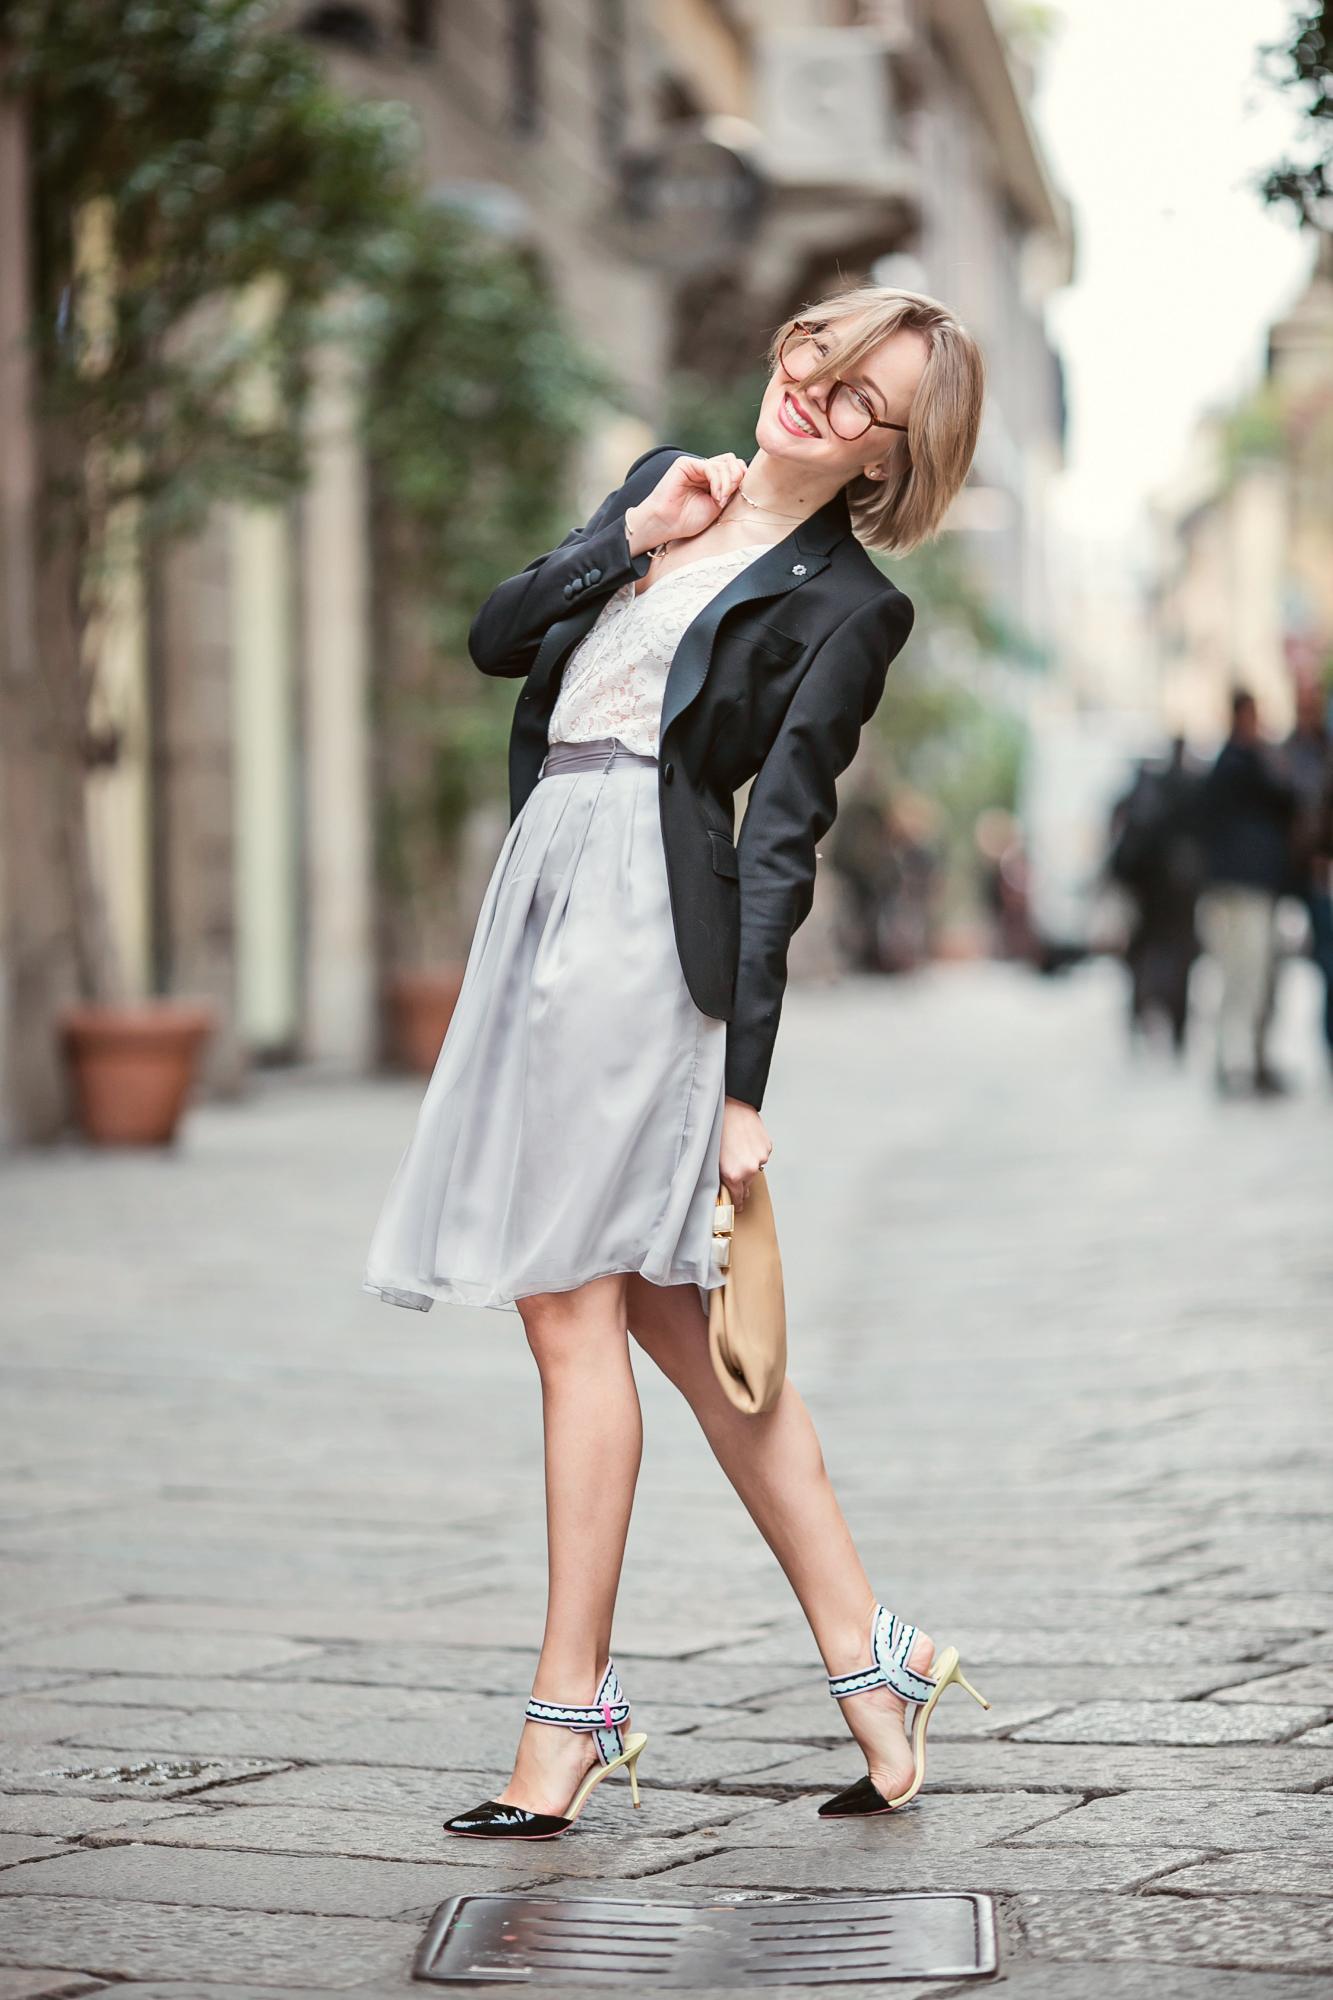 darya kamalova from thecablook com on lardini presentation in Milan and in attila showroom wearing lardini perfect black jacket with marni retro clutch and sophia webster kitten heels-40 copy